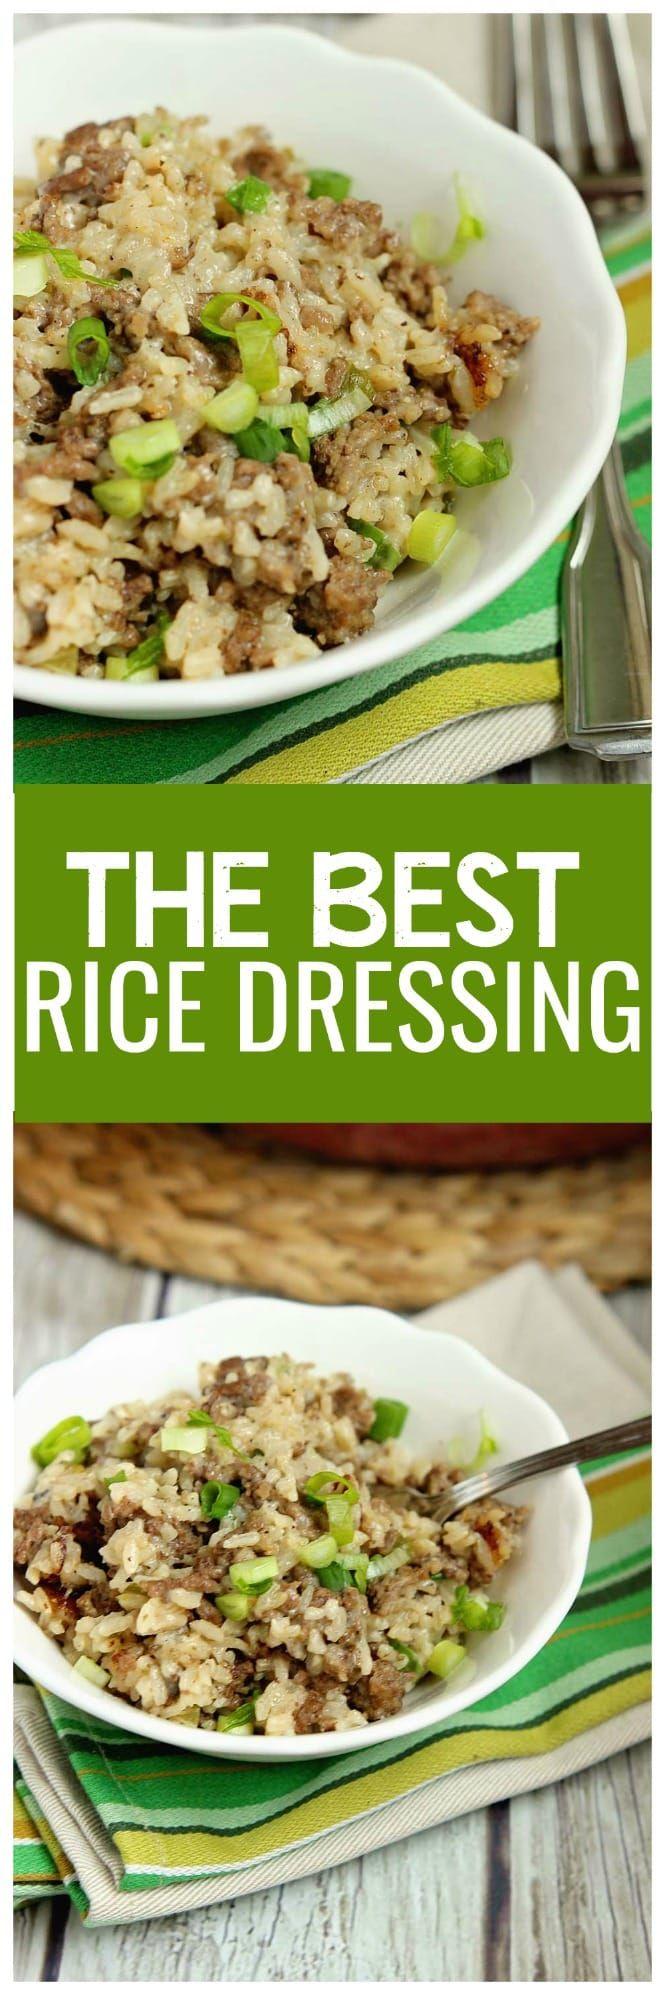 Best Rice Dressing Recipe Rice stuffing, Rice dressing